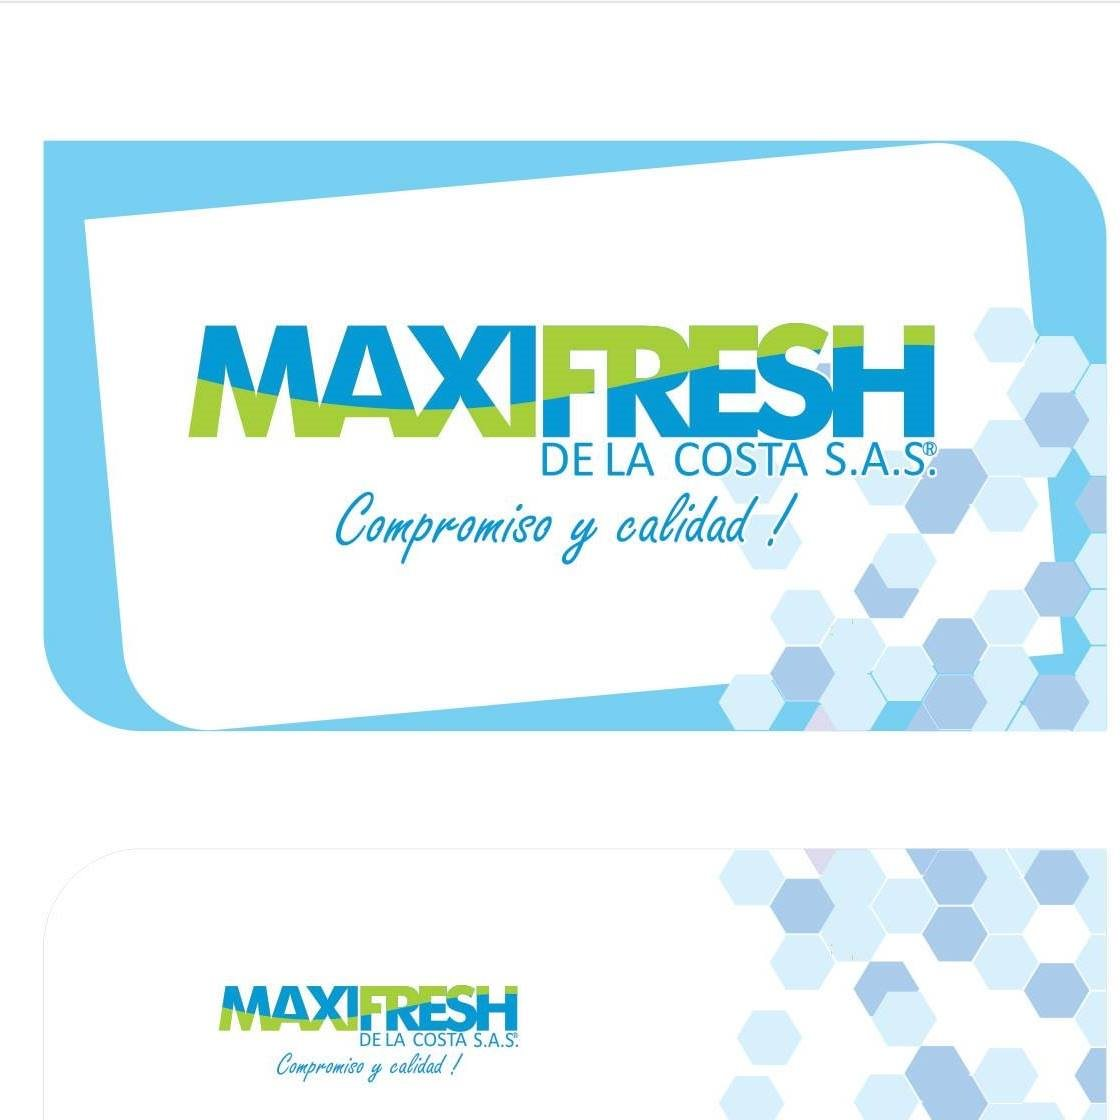 MAXIFRESH DE LA COSTA S.A.S